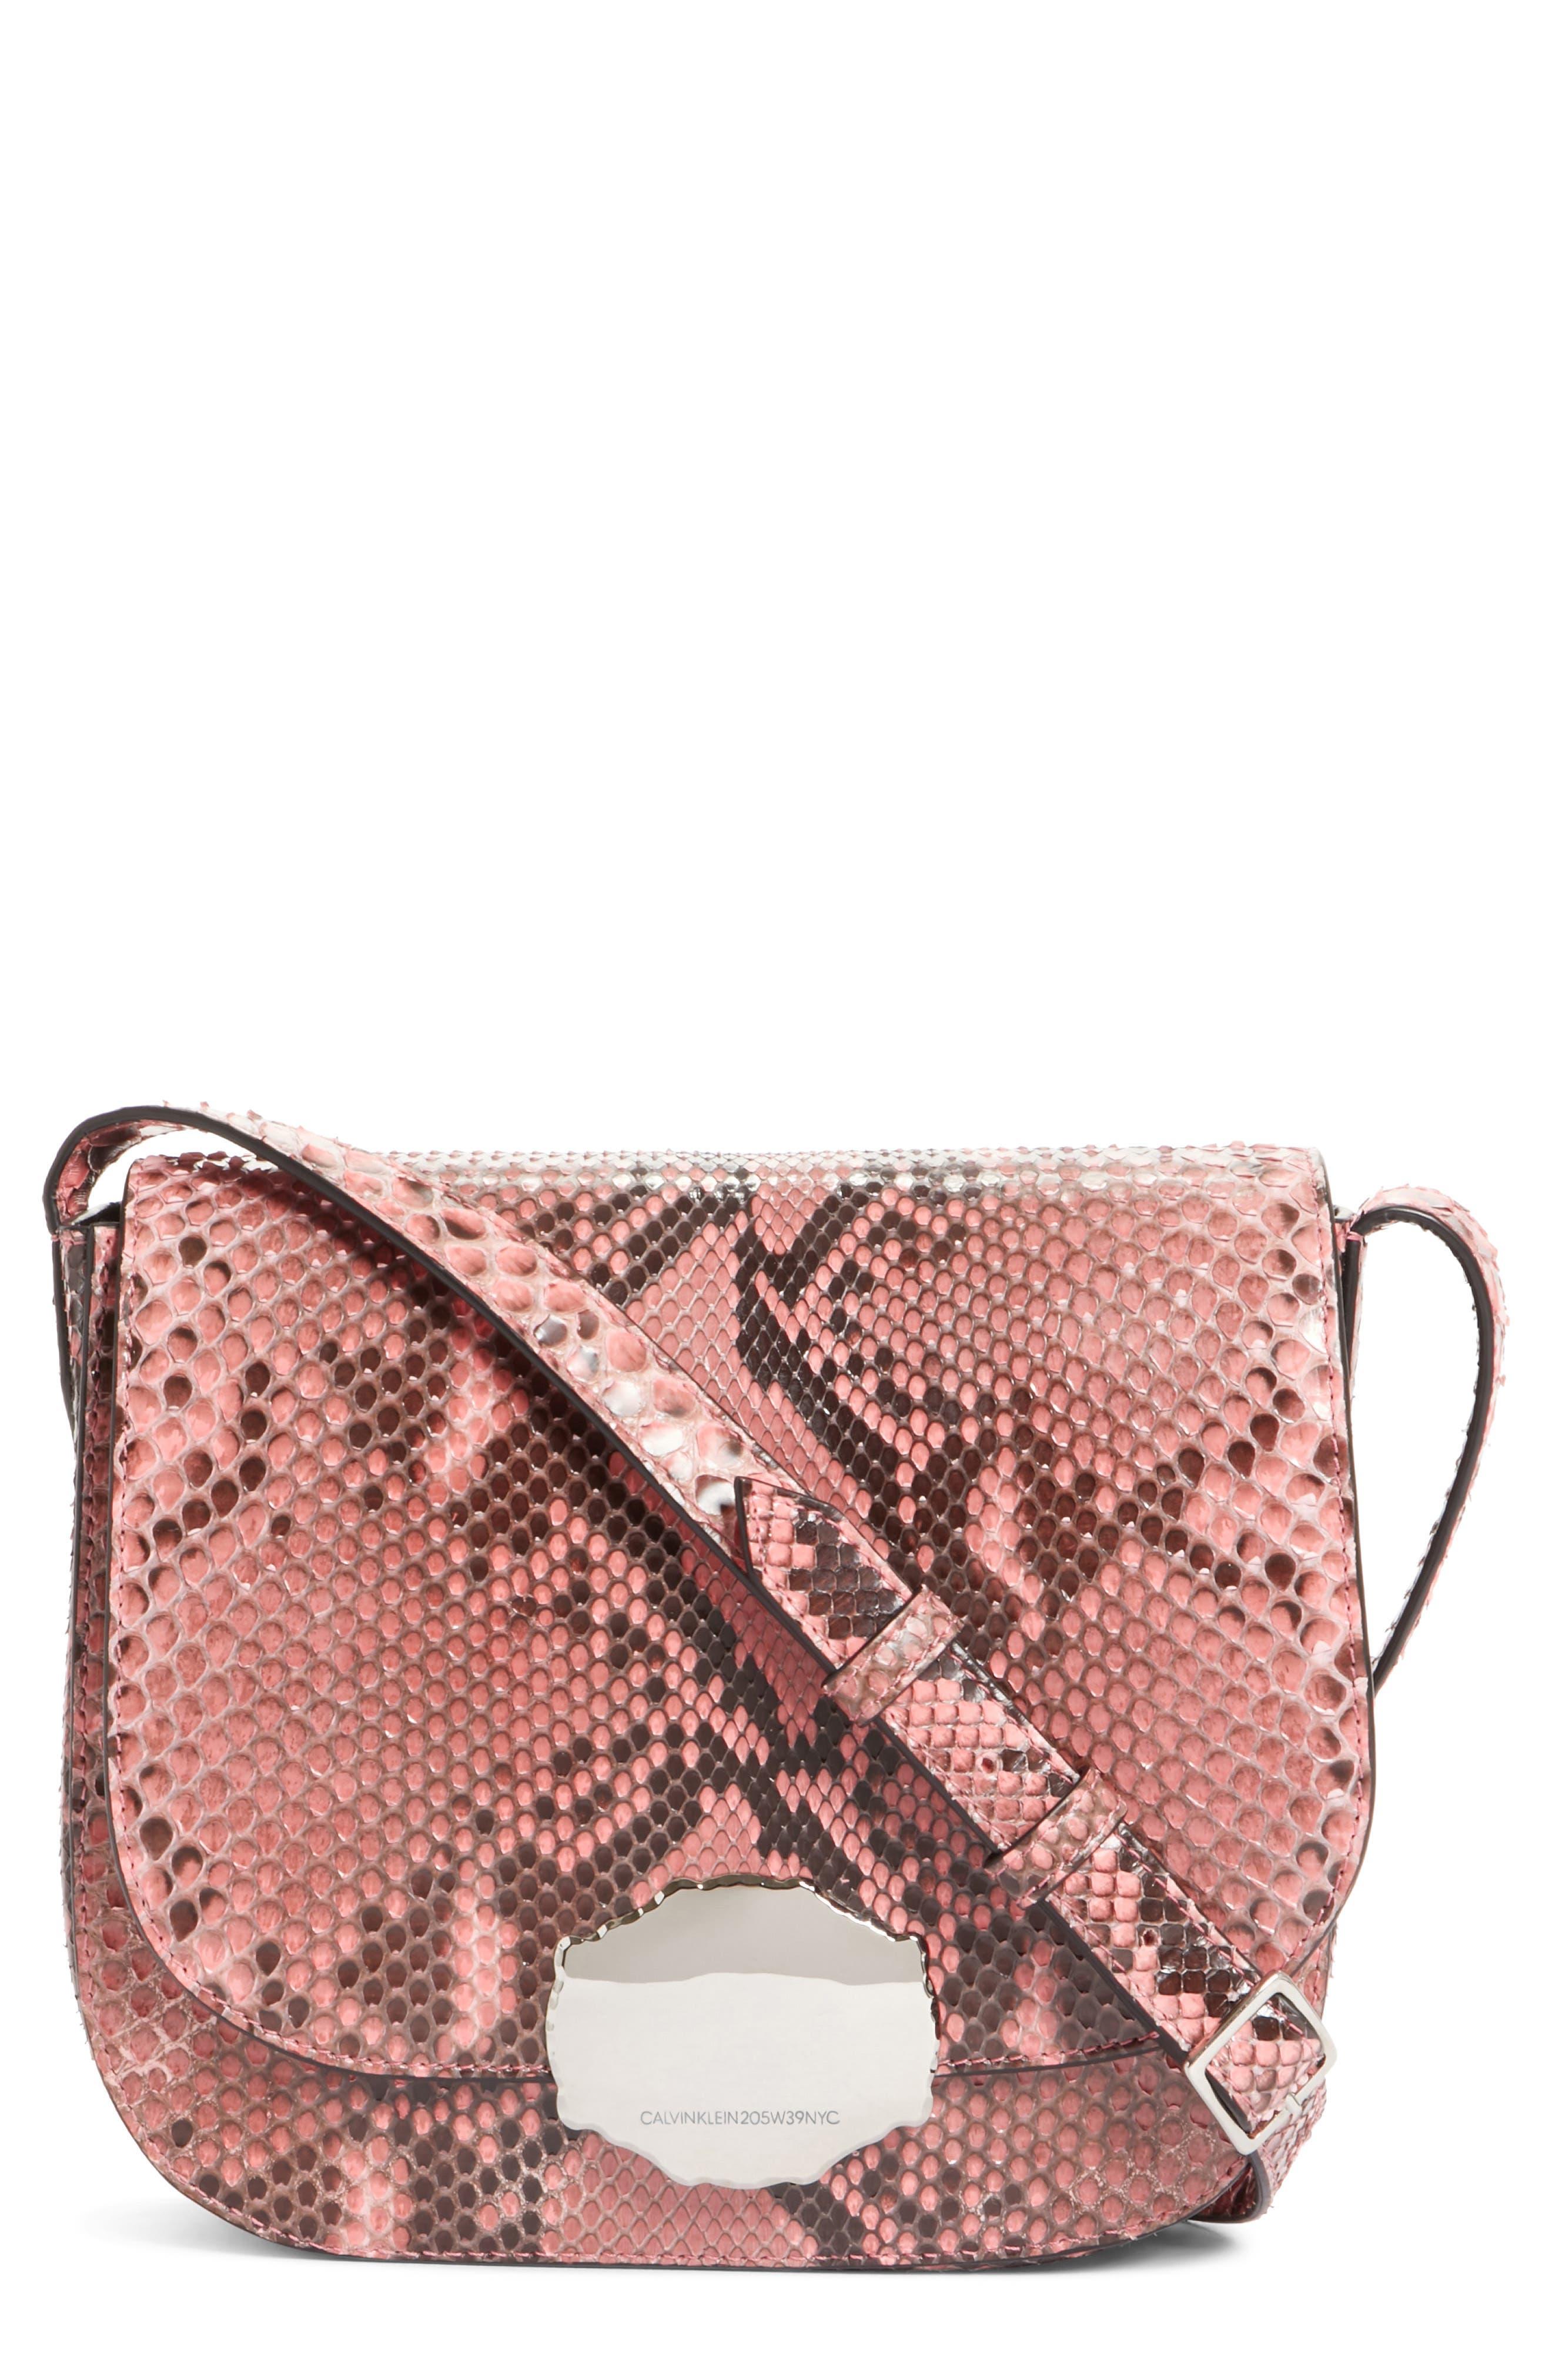 Alternate Image 1 Selected - Calvin Klein 205W395NYC Genuine Python Shoulder Bag